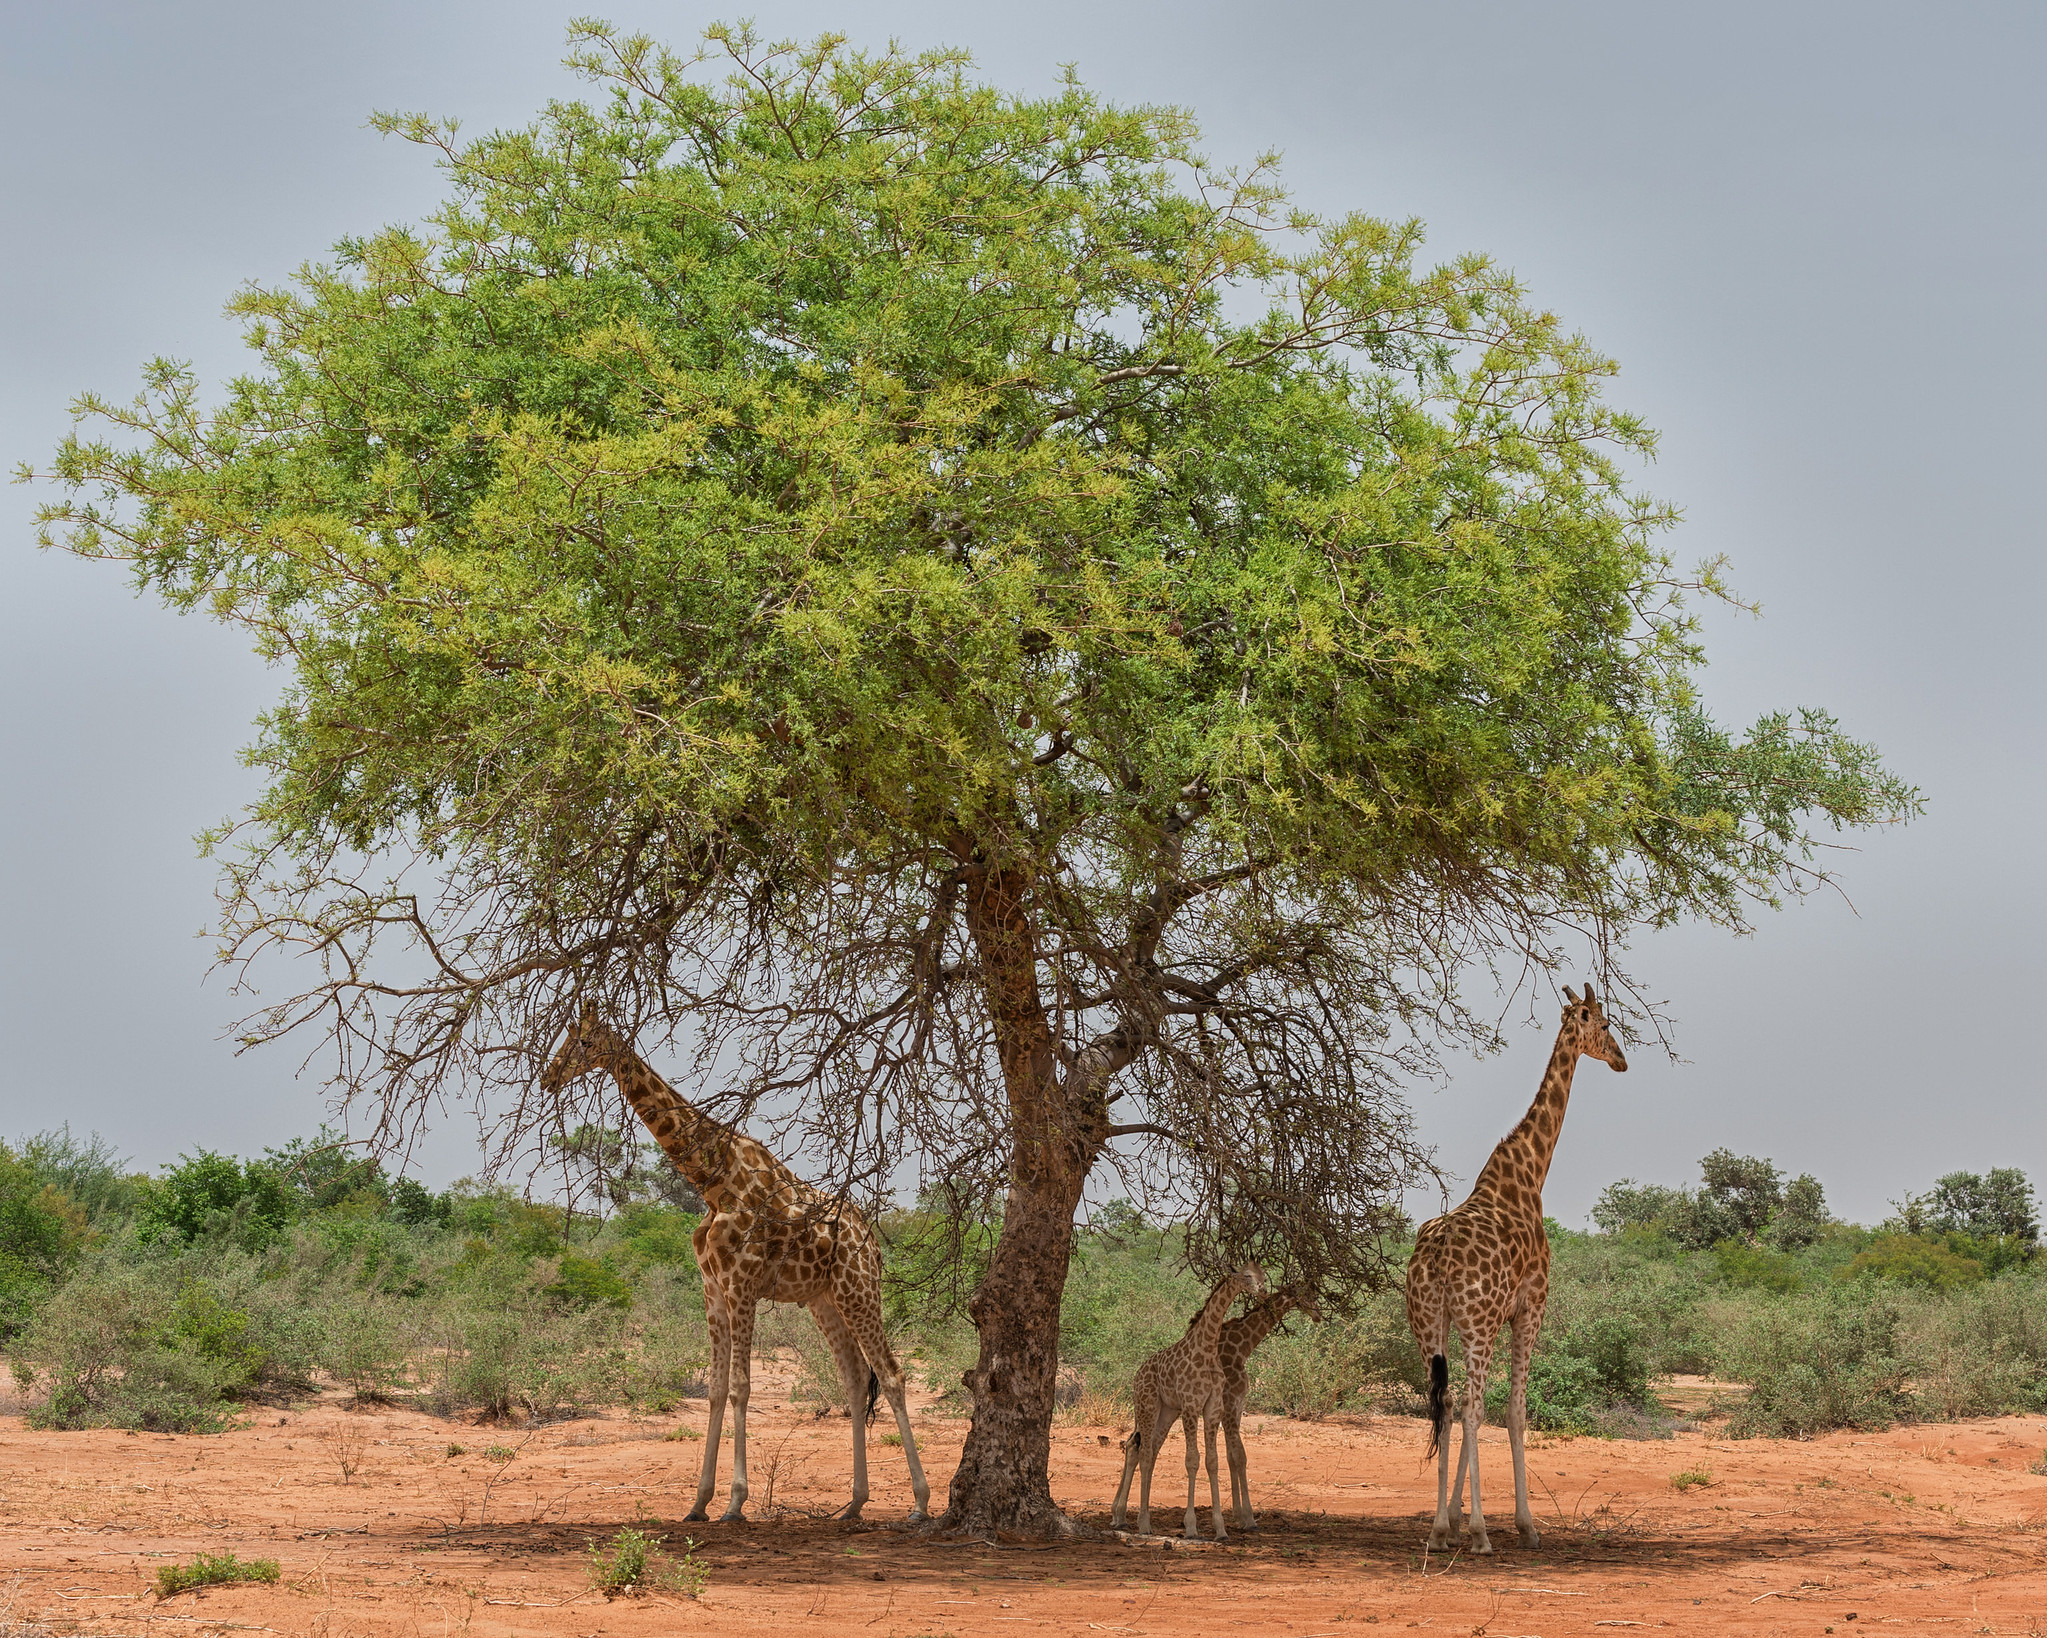 Giraffes in the Shade